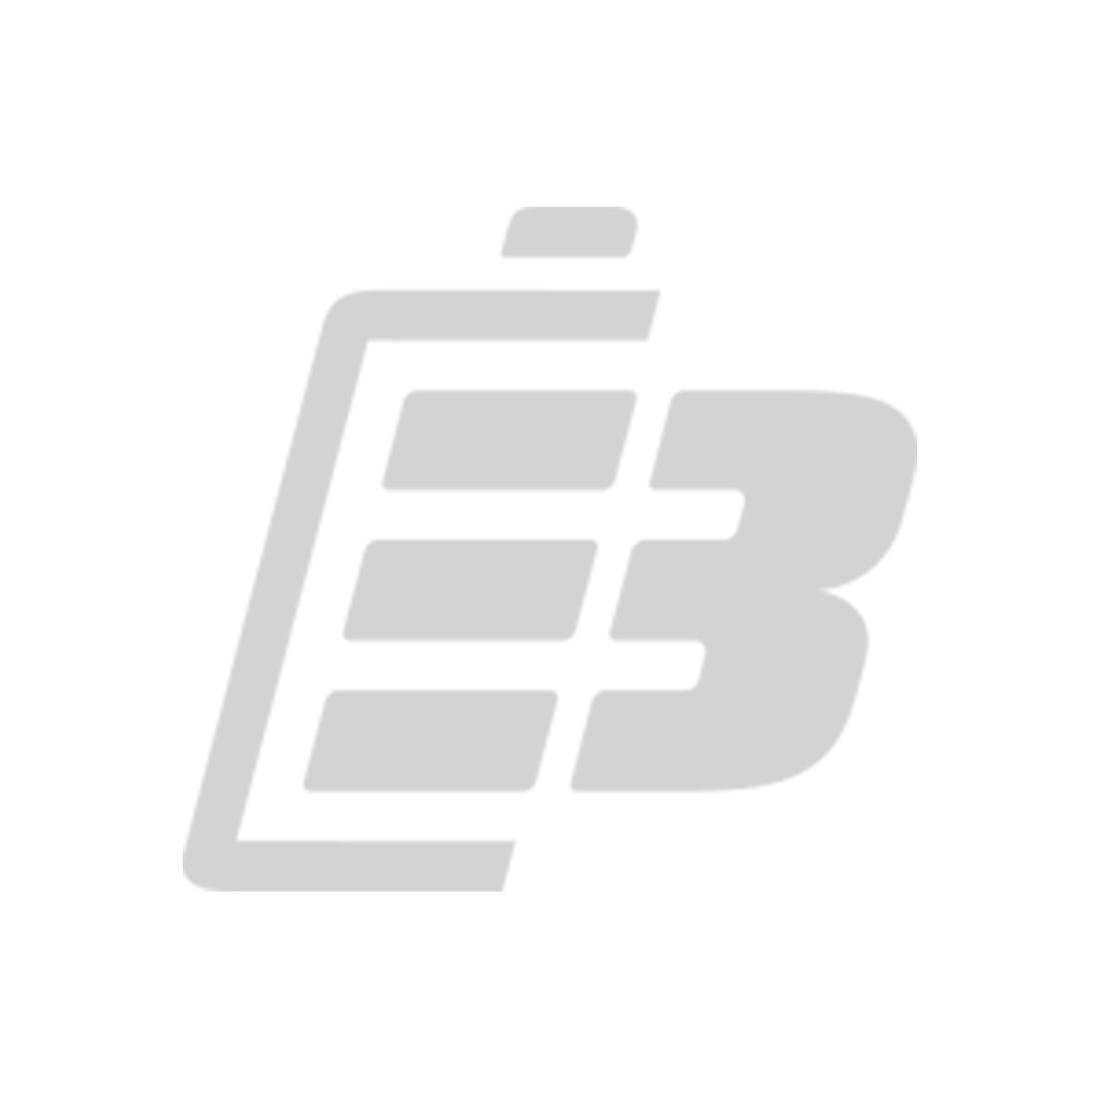 Choetech C0028 LED Indicator Wall Adapter 2 x USB